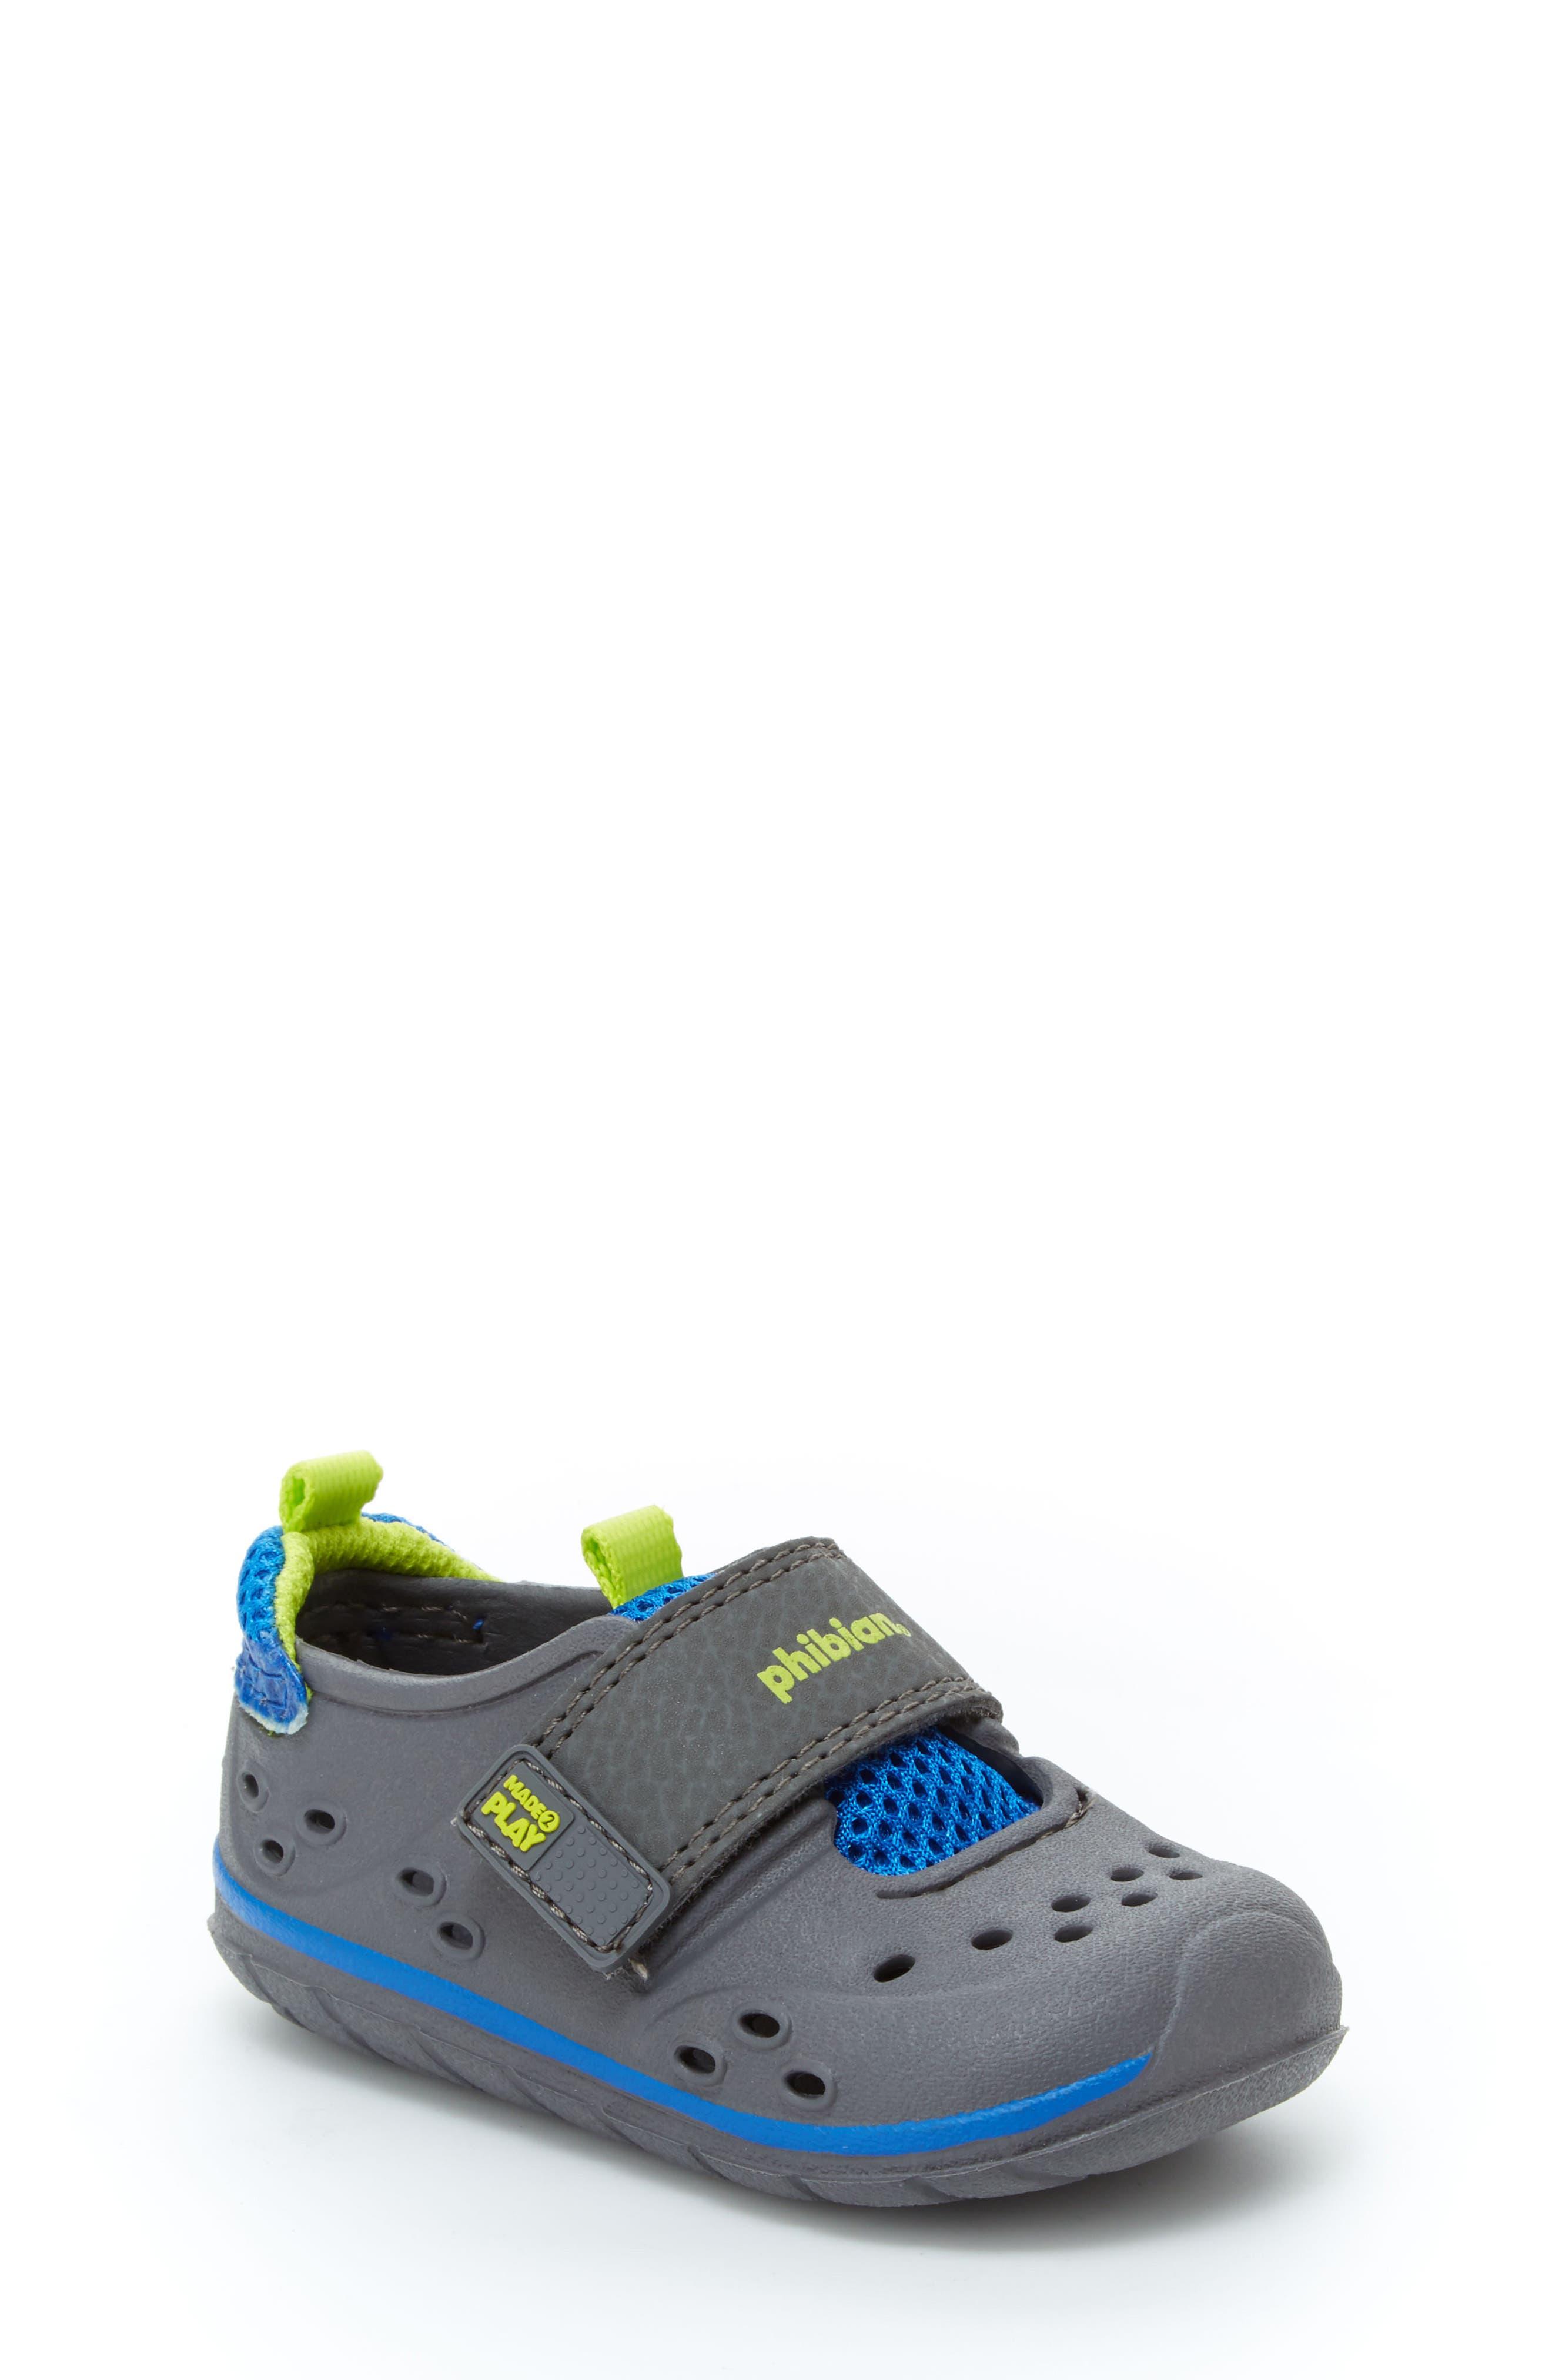 Made2Play<sup>®</sup> Phibian Sneaker,                         Main,                         color, GREY/ GREY